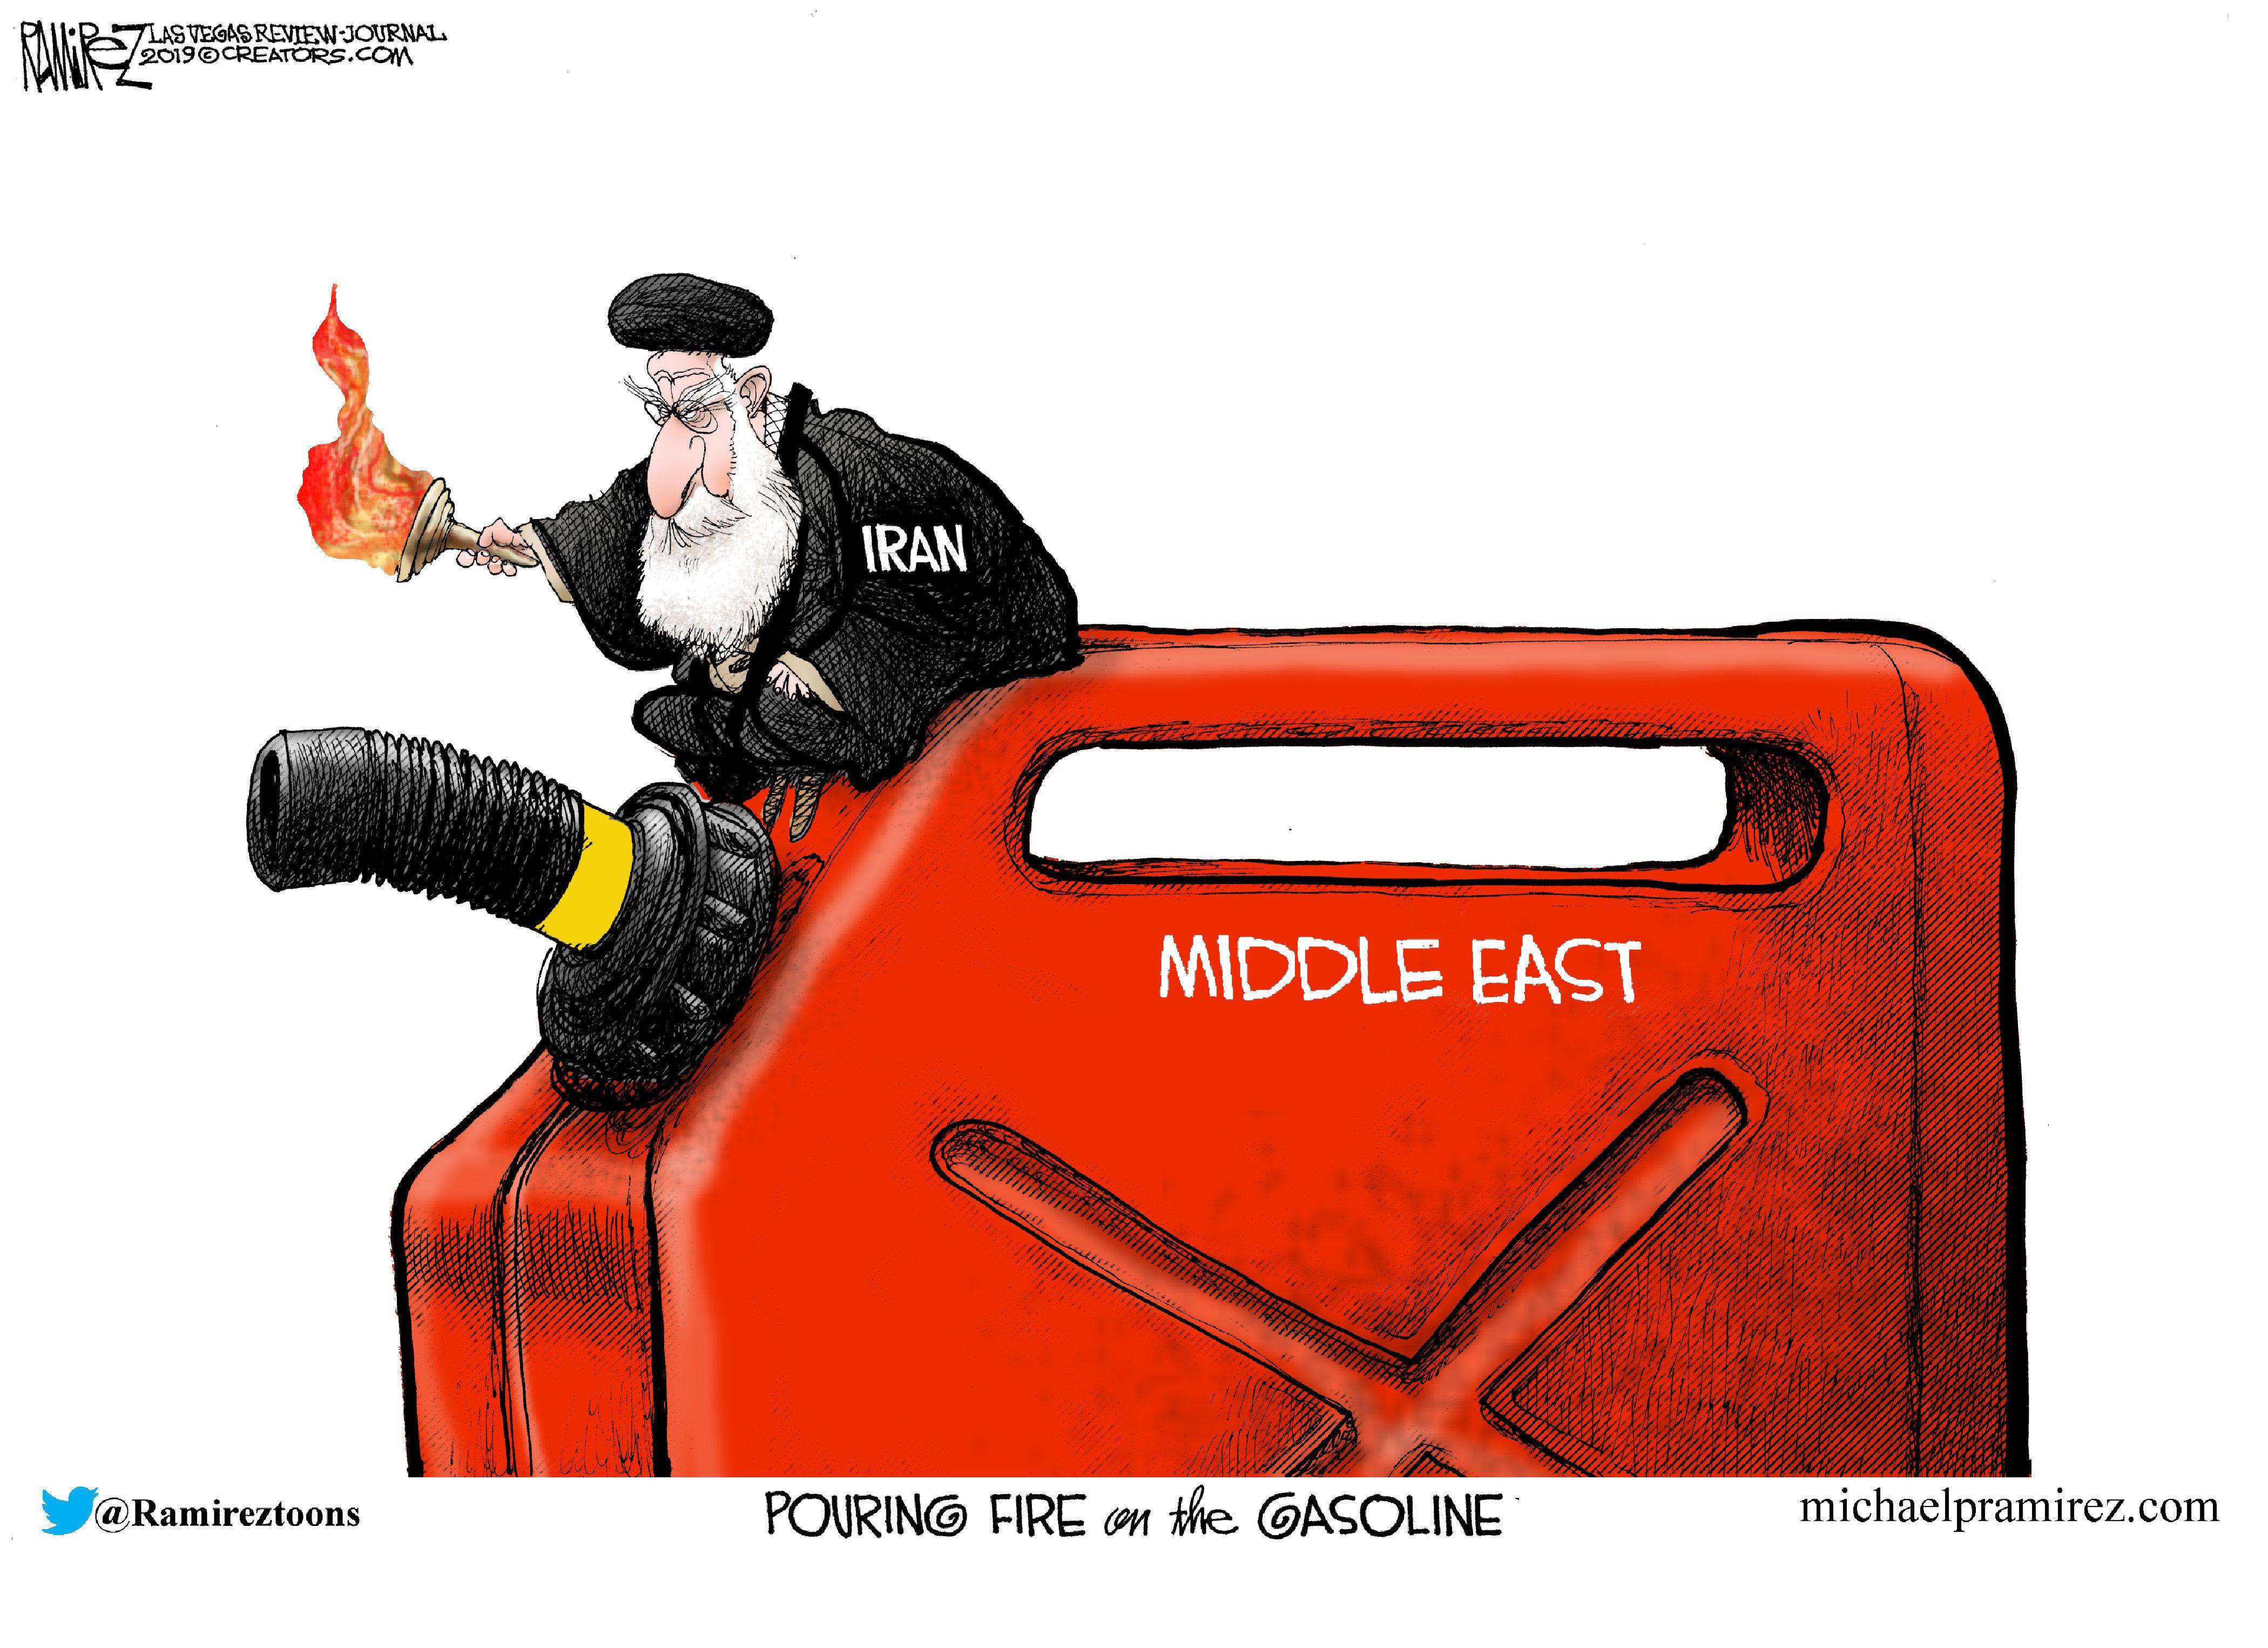 Editorial cartoons for Sept. 22, 2019: Saudi drone attack, presidential campaign, impeachment talk